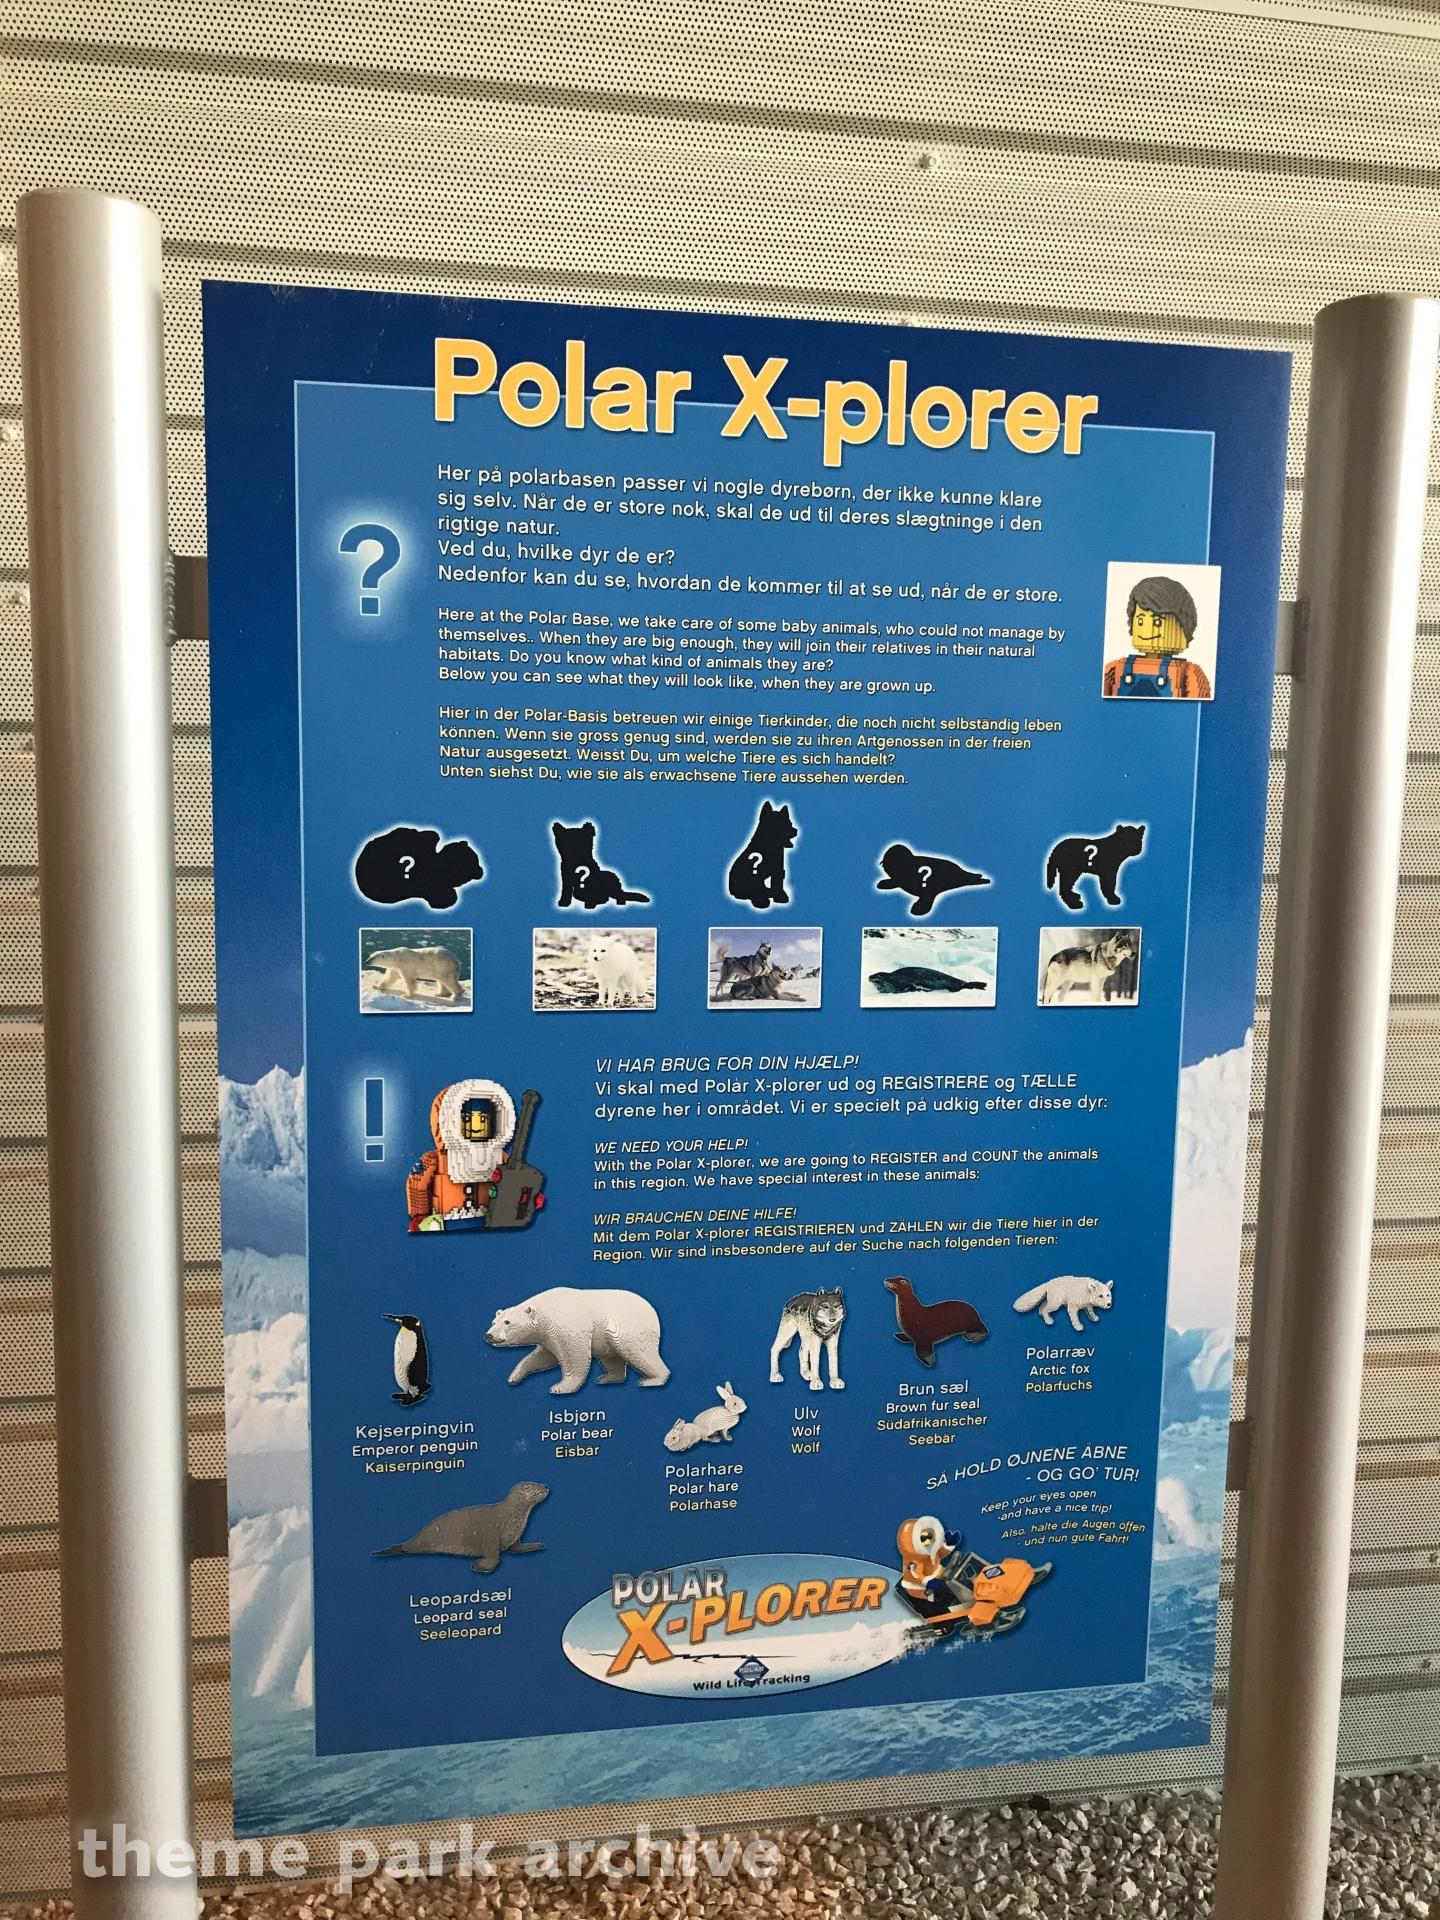 Polar Xplorer at LEGOLAND Billund